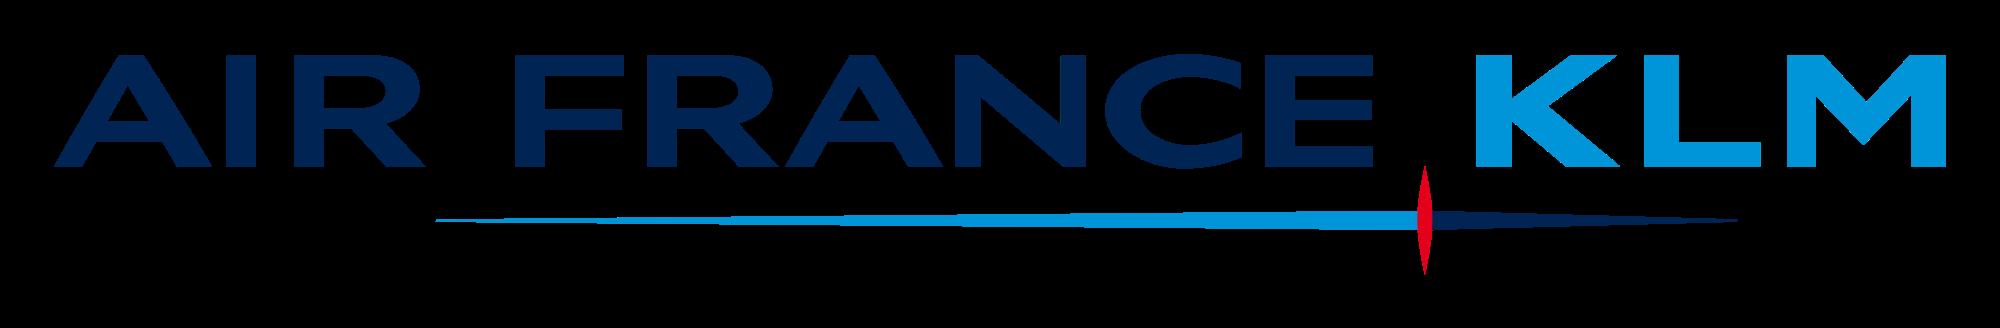 logo-air-france-klm-png-open-2000.png